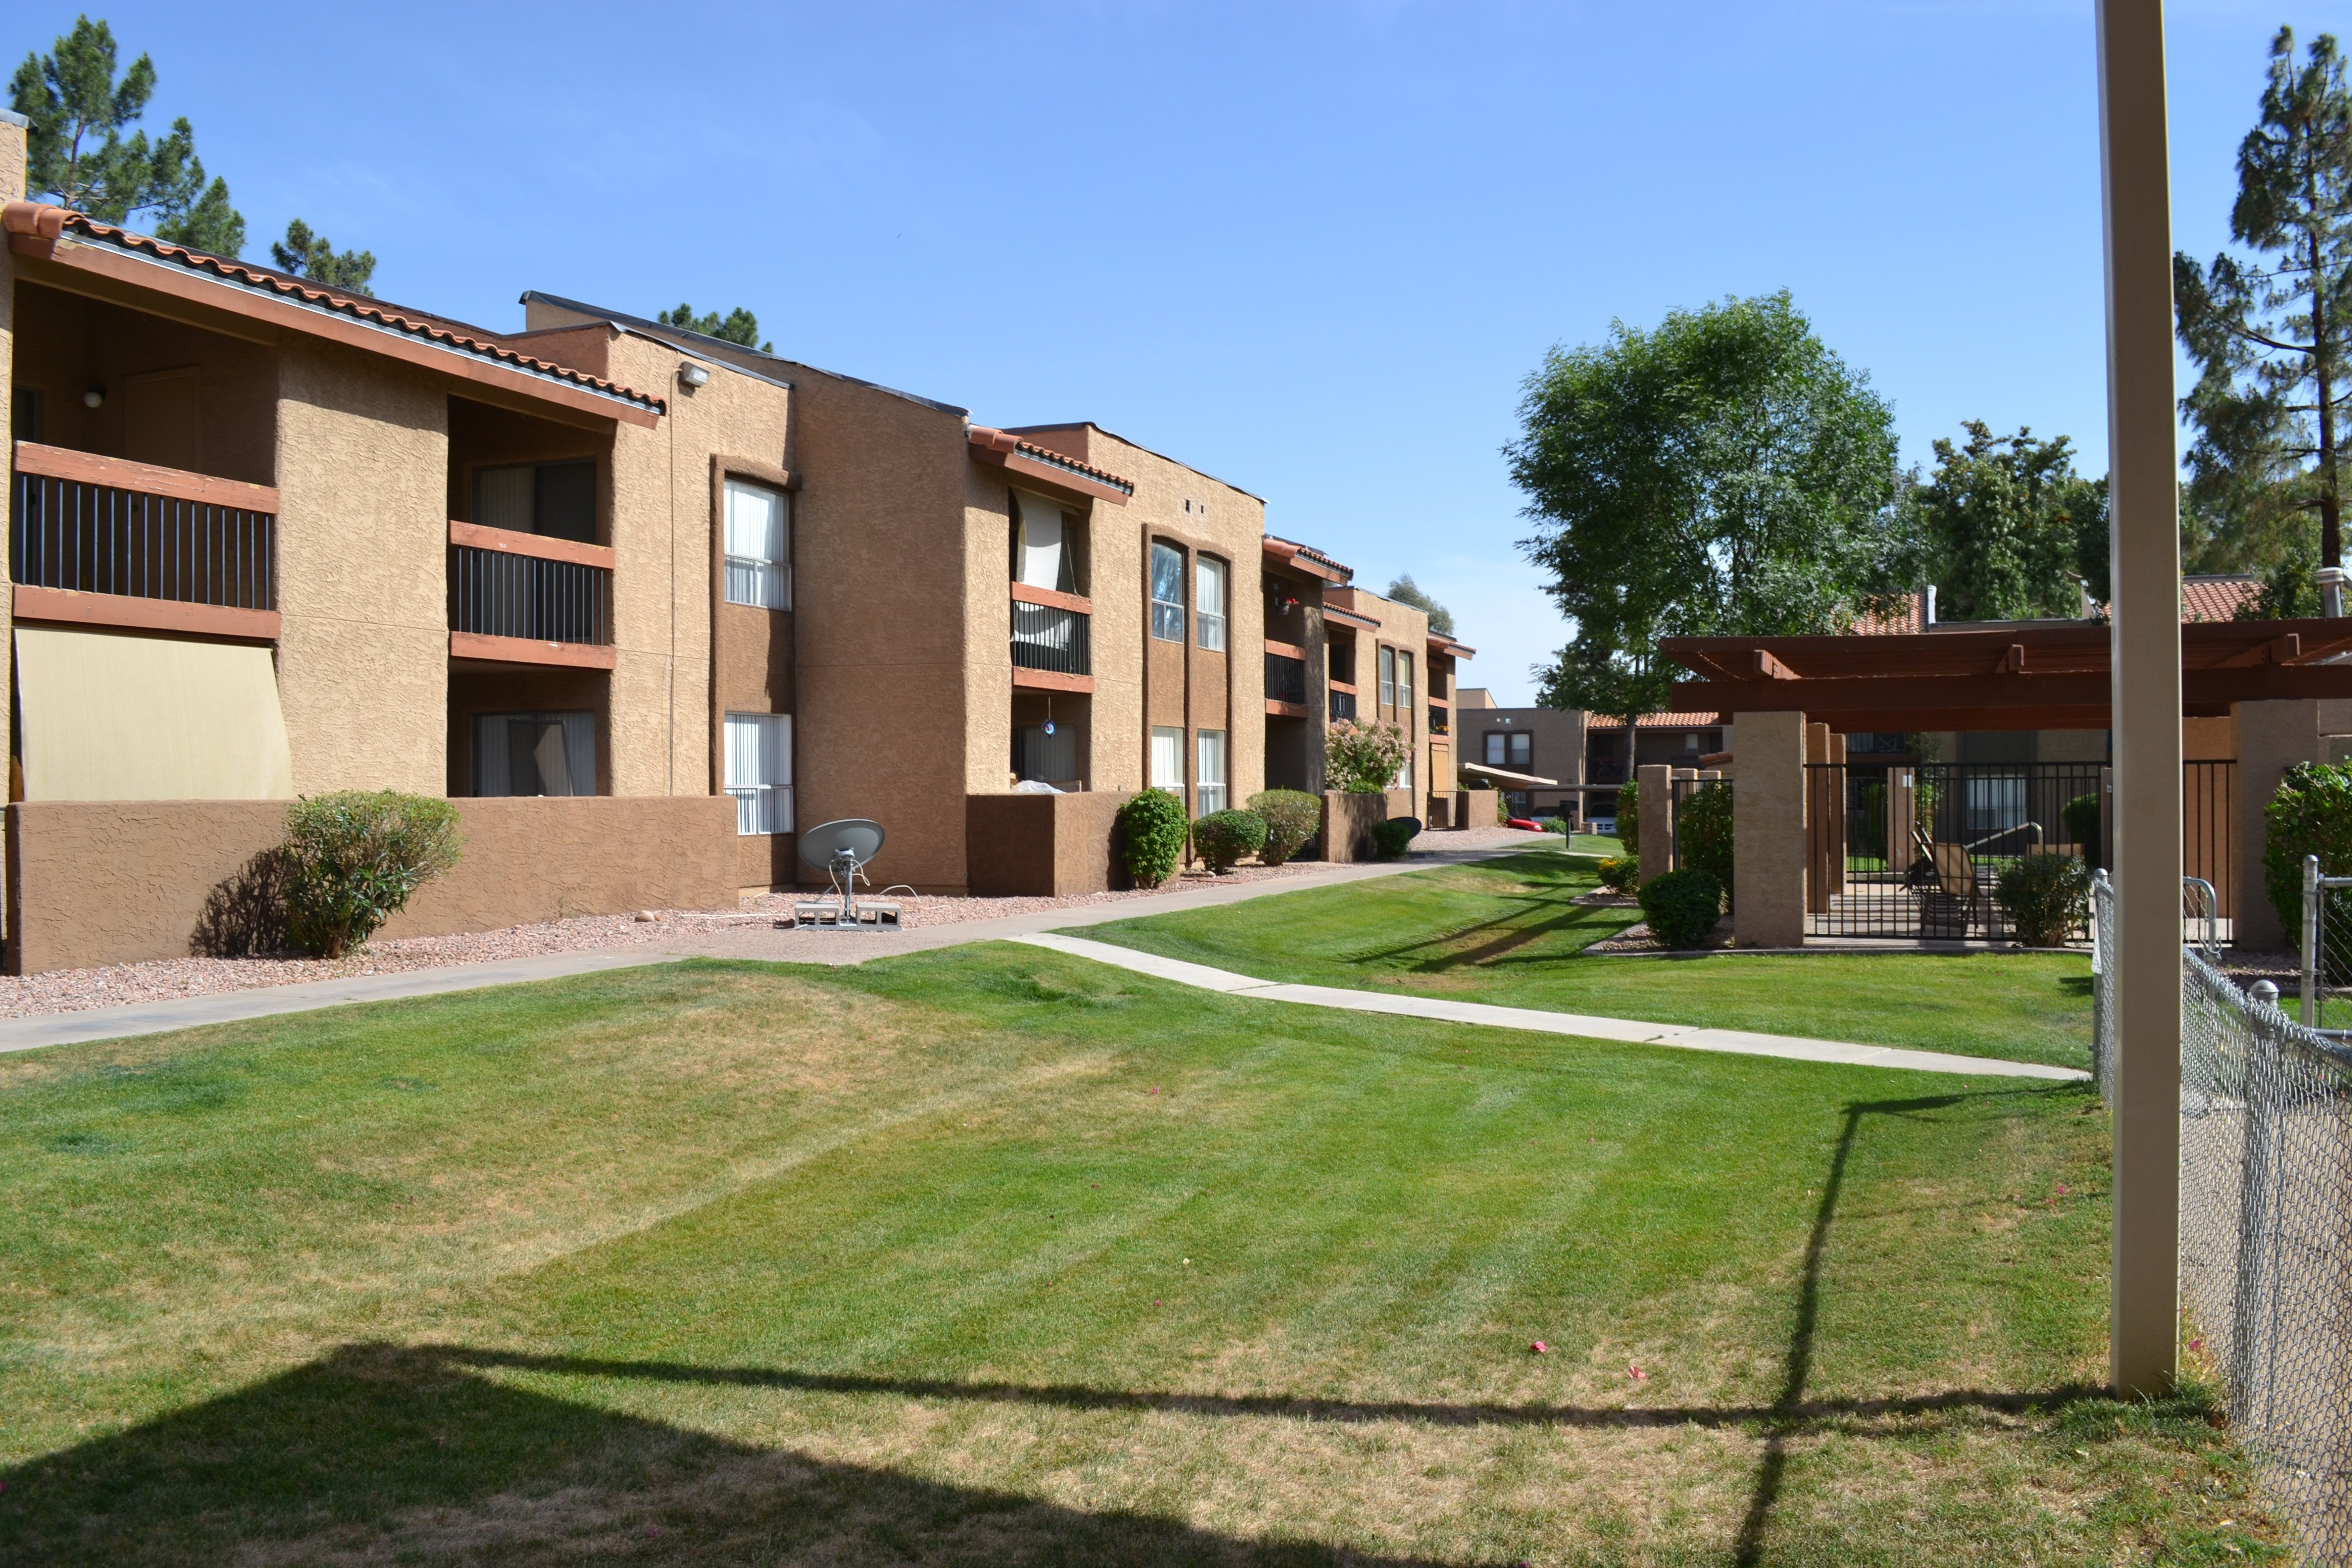 Aztec Springs Apartments image 2